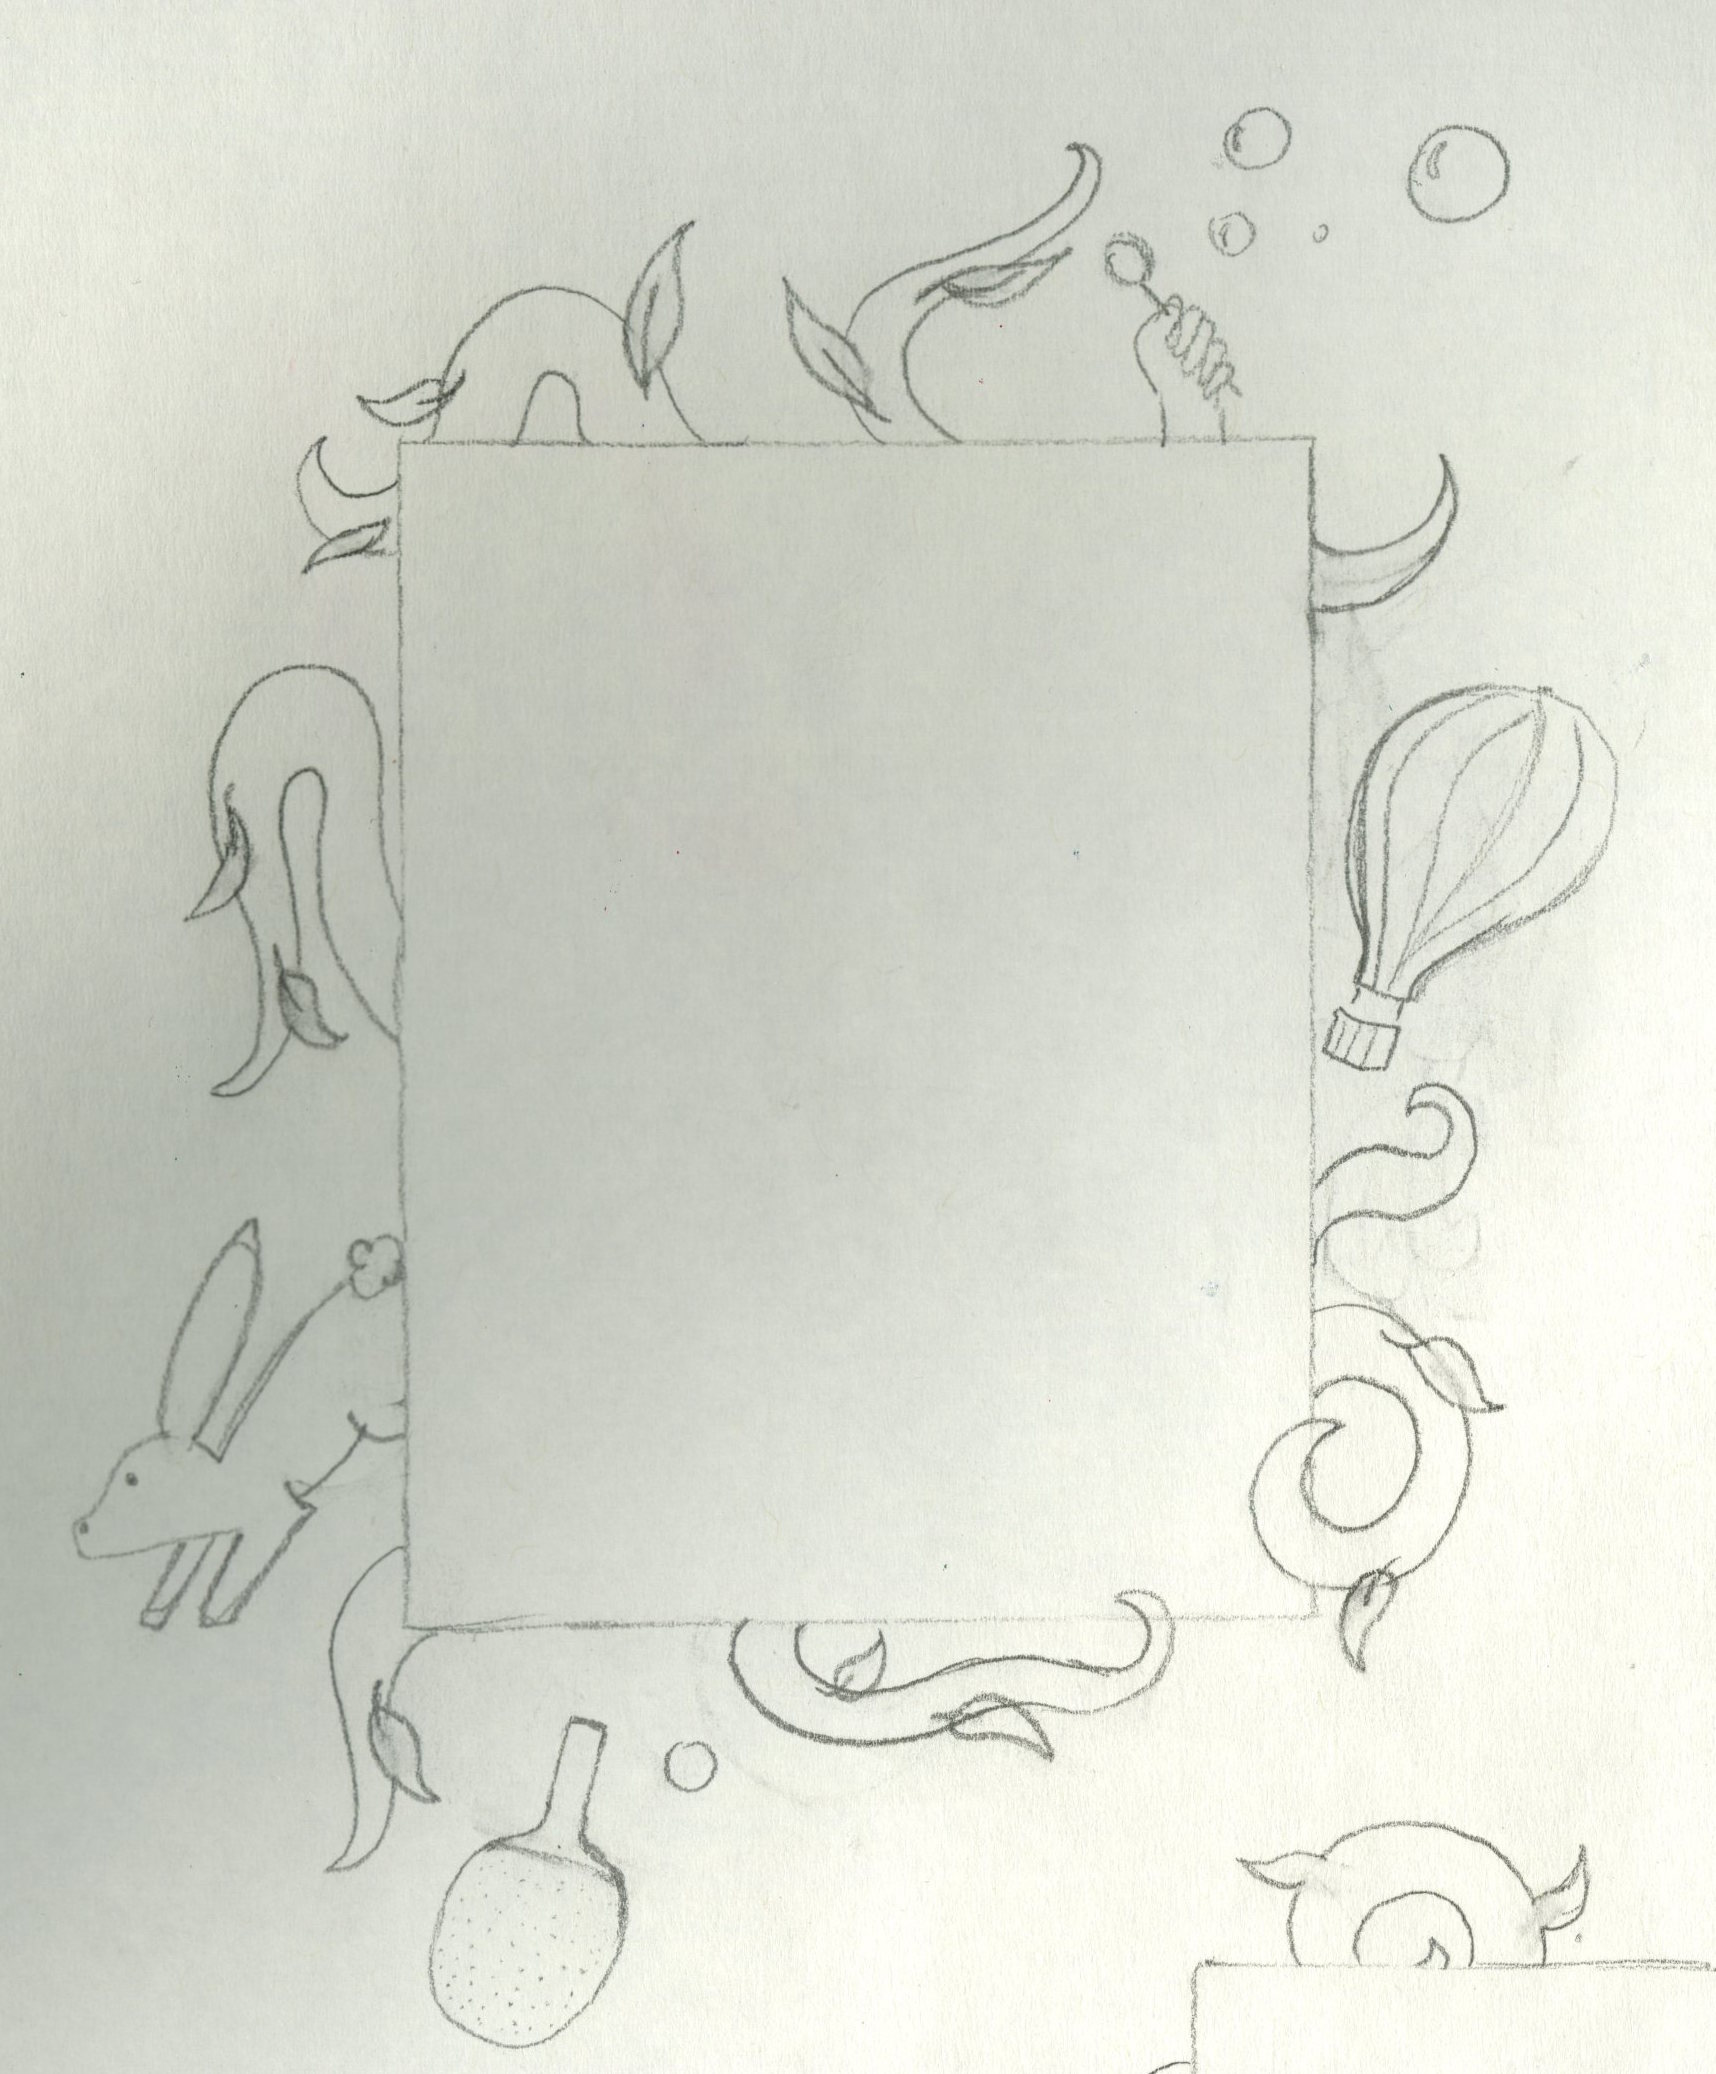 illustrationprocess.jpg